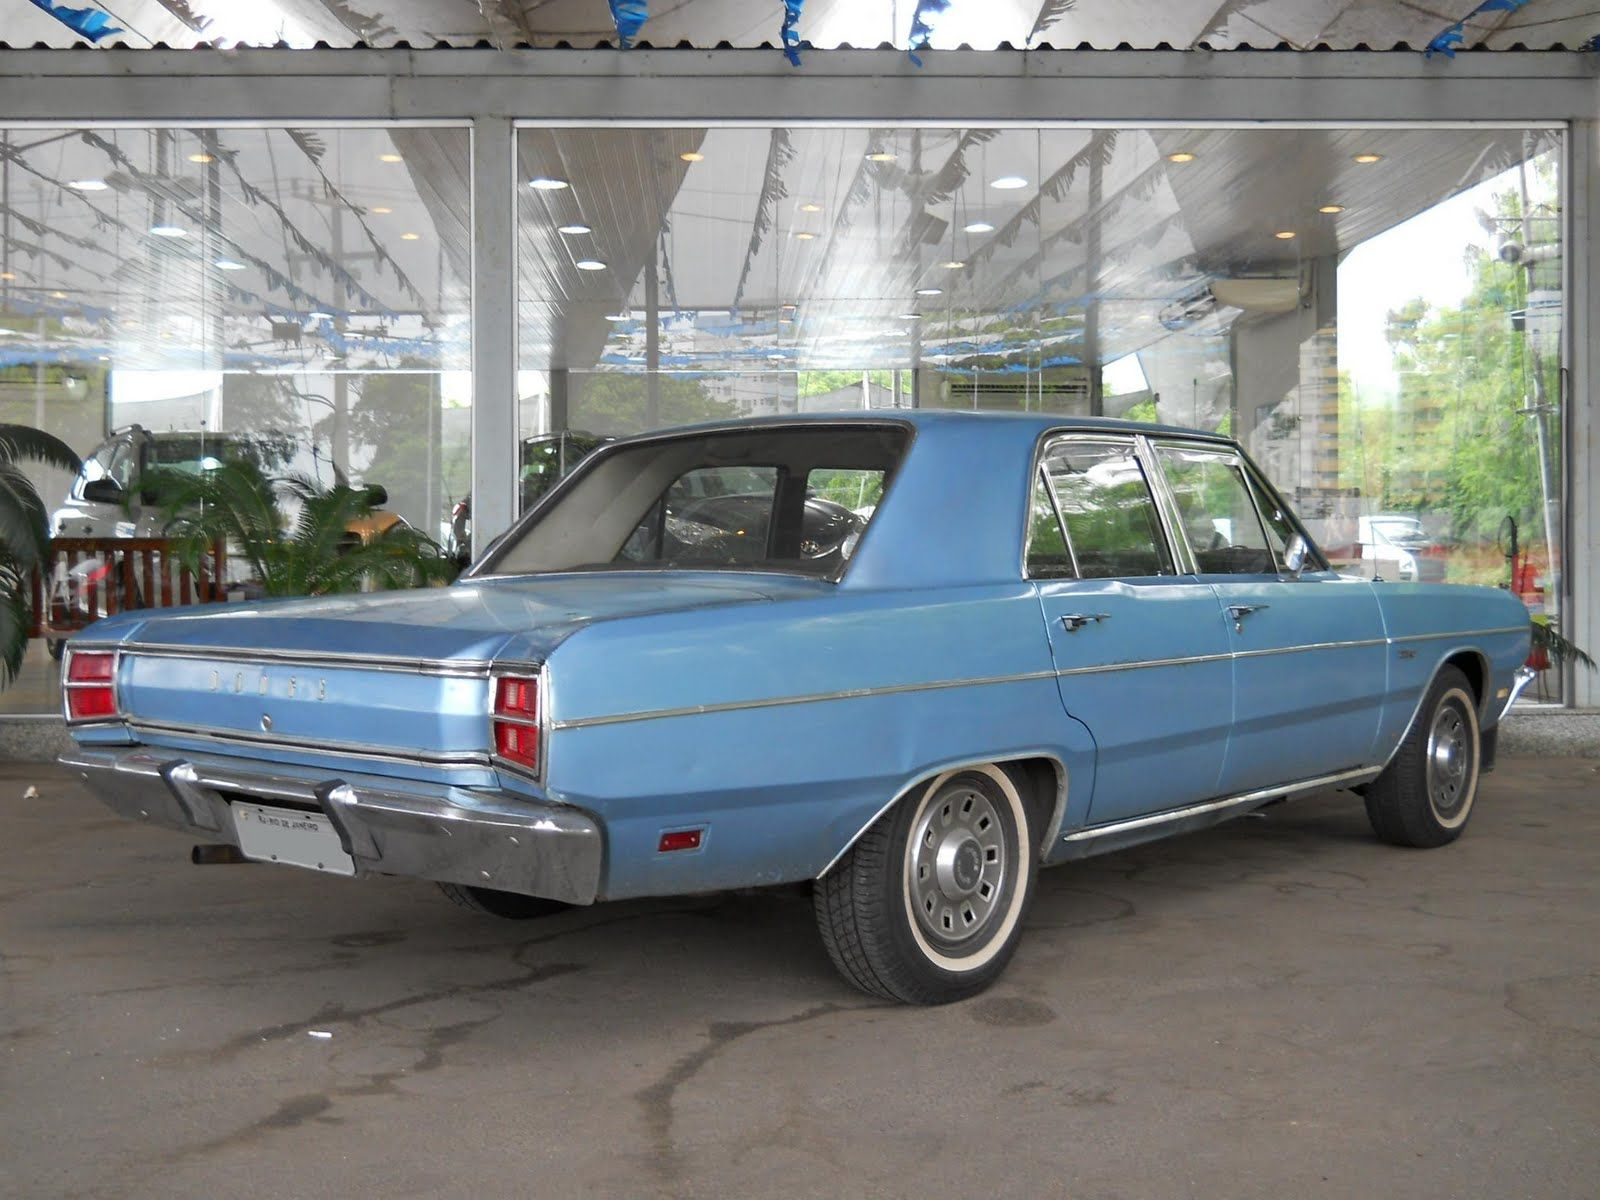 1970 Dodge Dart Sedan Chrysler Do Brasil 1970 A 1980